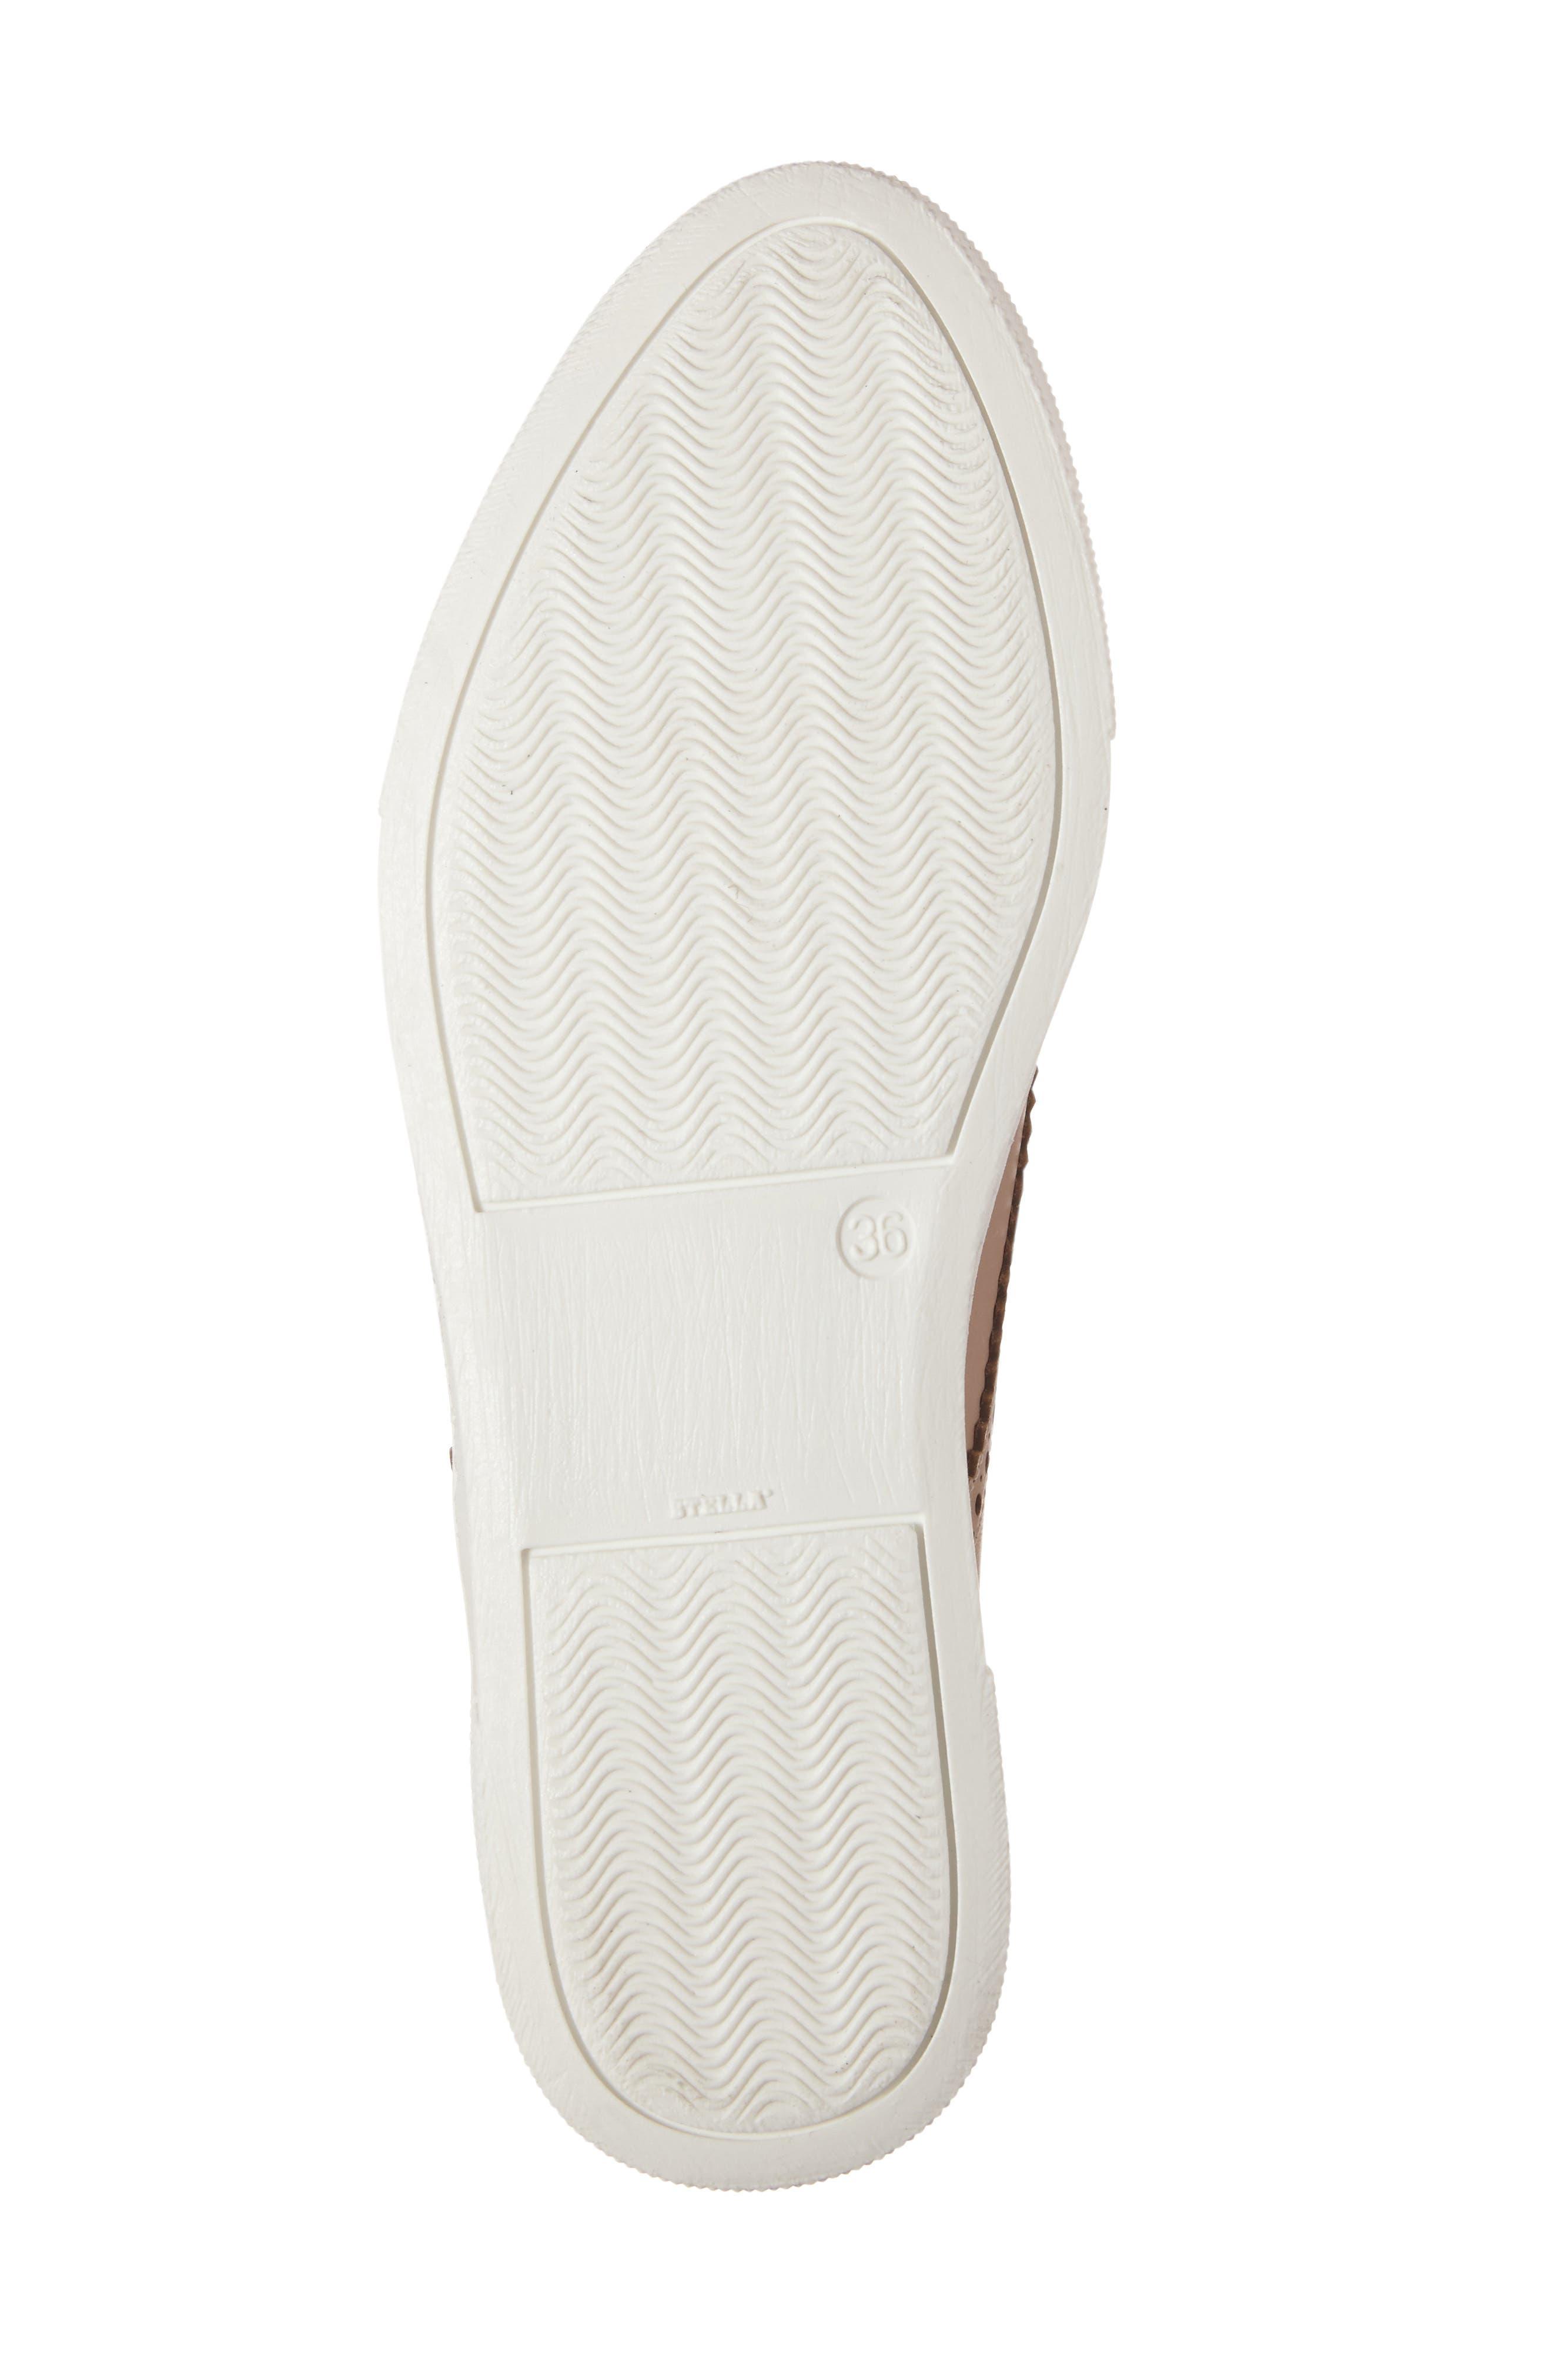 Kimmie Perforated Platform Sneaker,                             Alternate thumbnail 16, color,